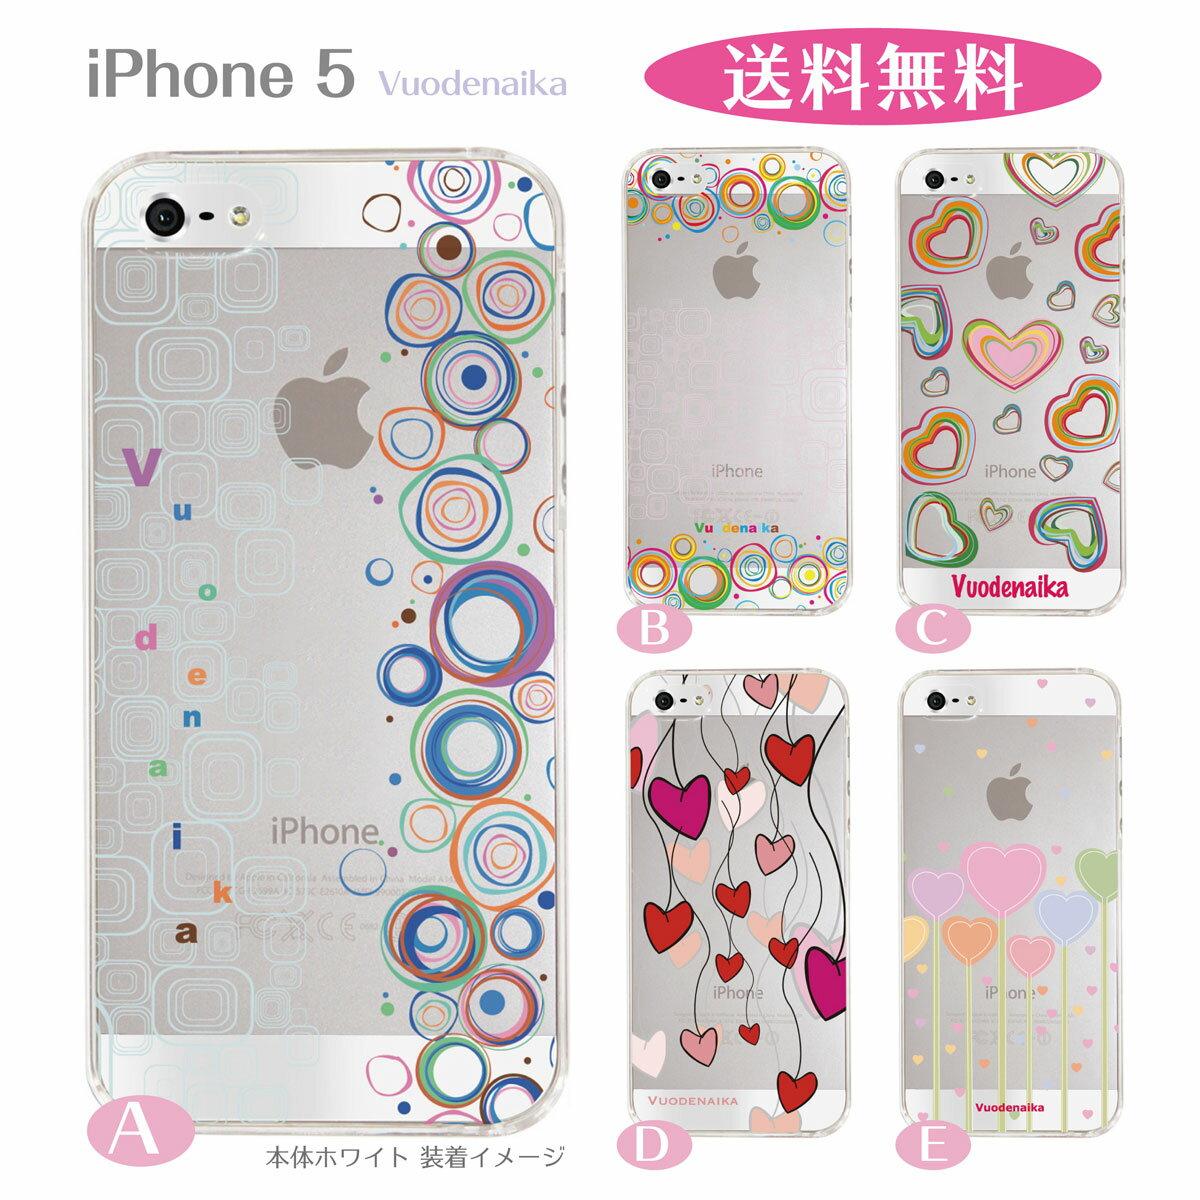 【iPhone5s】【iPhone5】【Vuodenaika】【iPhone5ケース】【カバー】【スマホケース】【クリアケース】 ip5-21-ne-so1